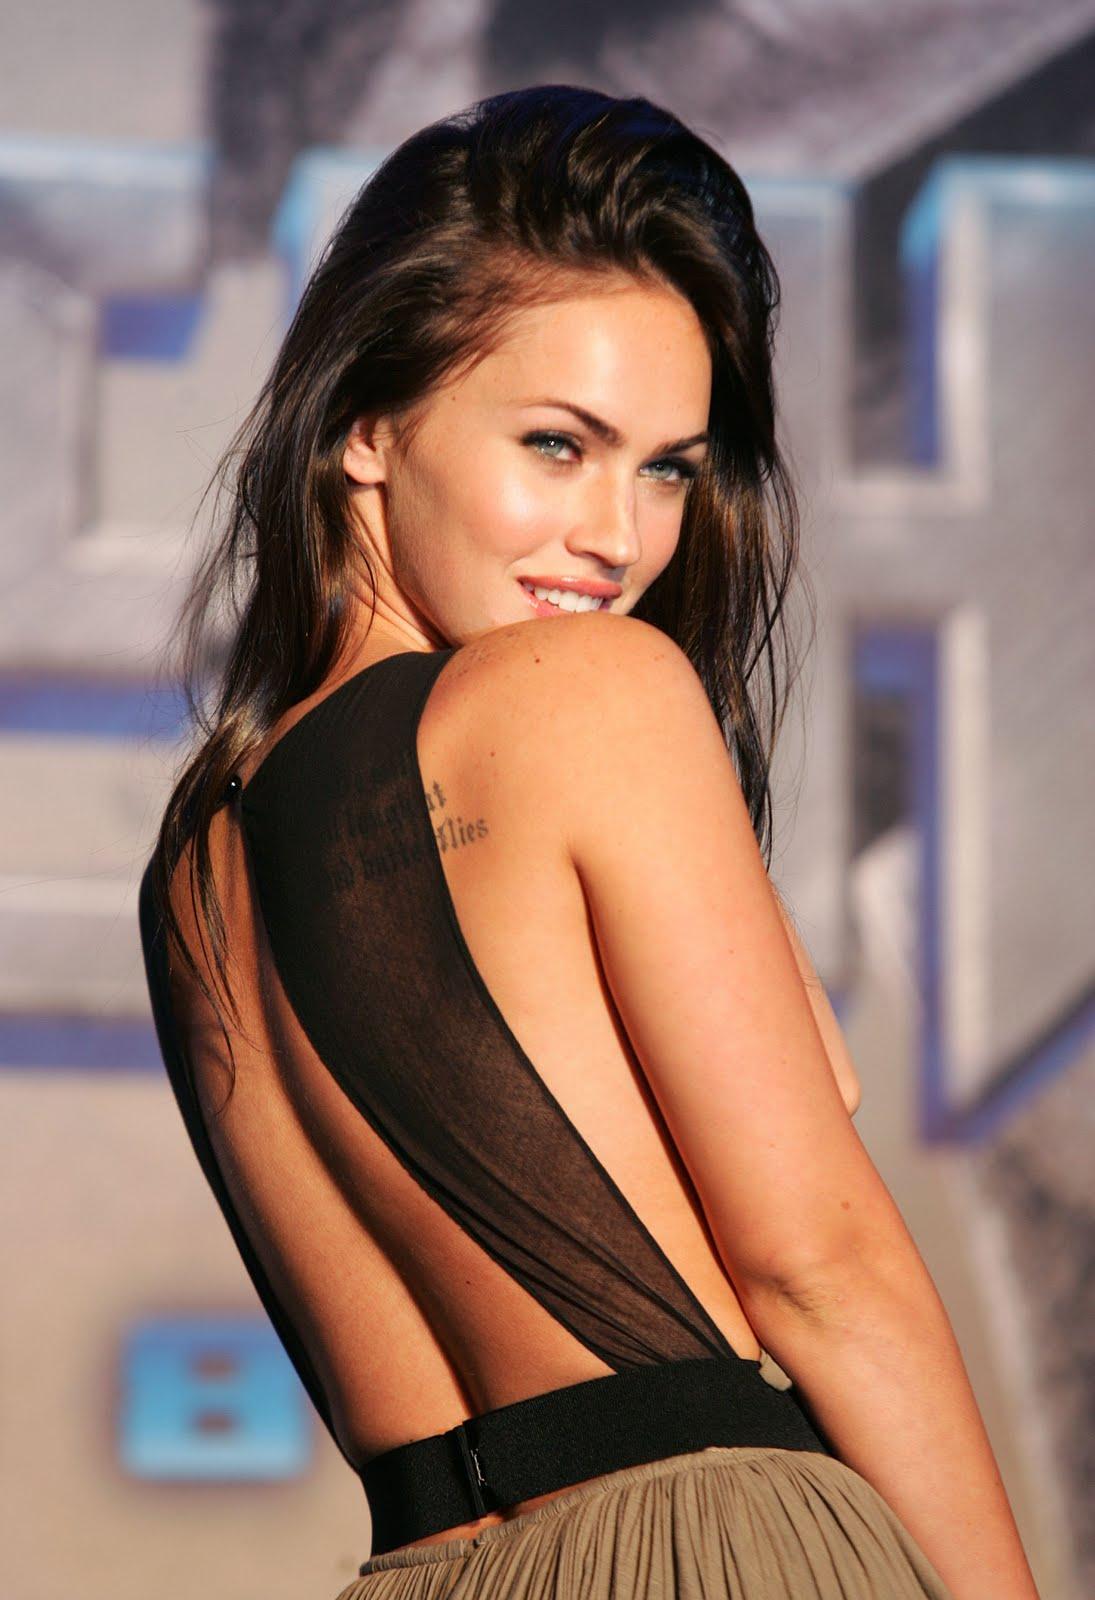 ThePhotoZone: Megan Fox Hot Photos Gallery